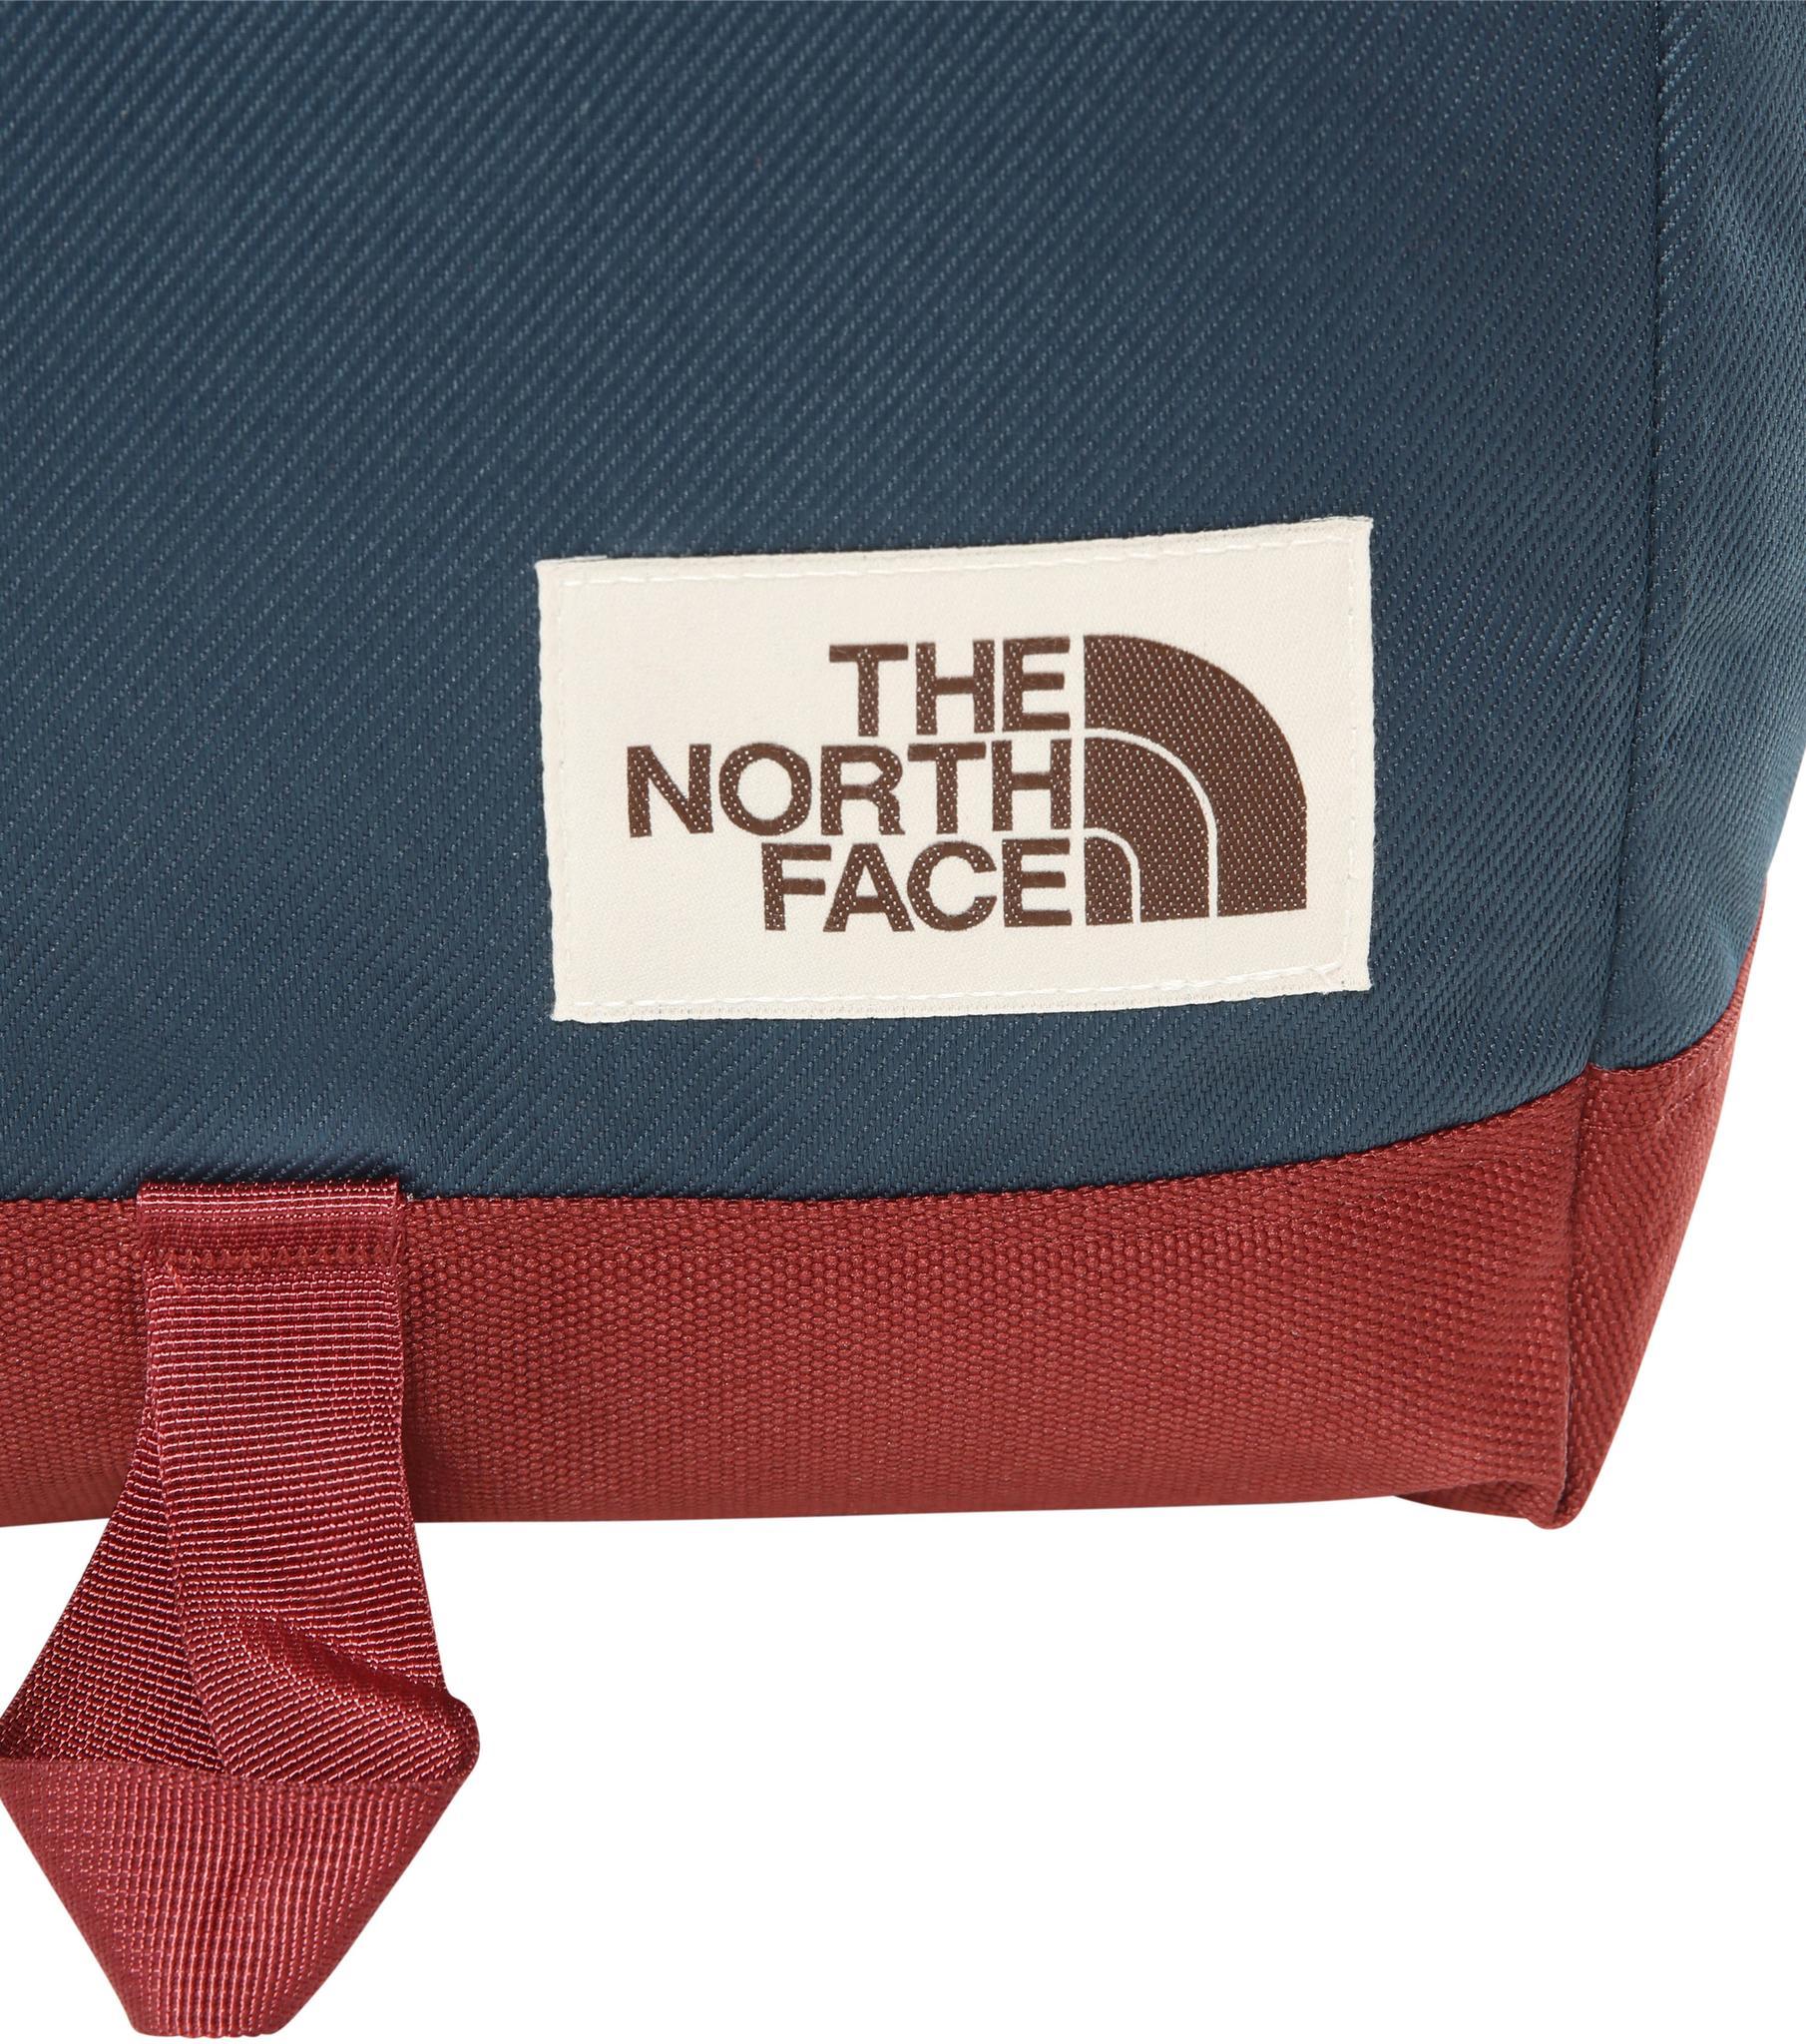 Рюкзак THE NORTH FACE DAYPACK Синий/Коричневый